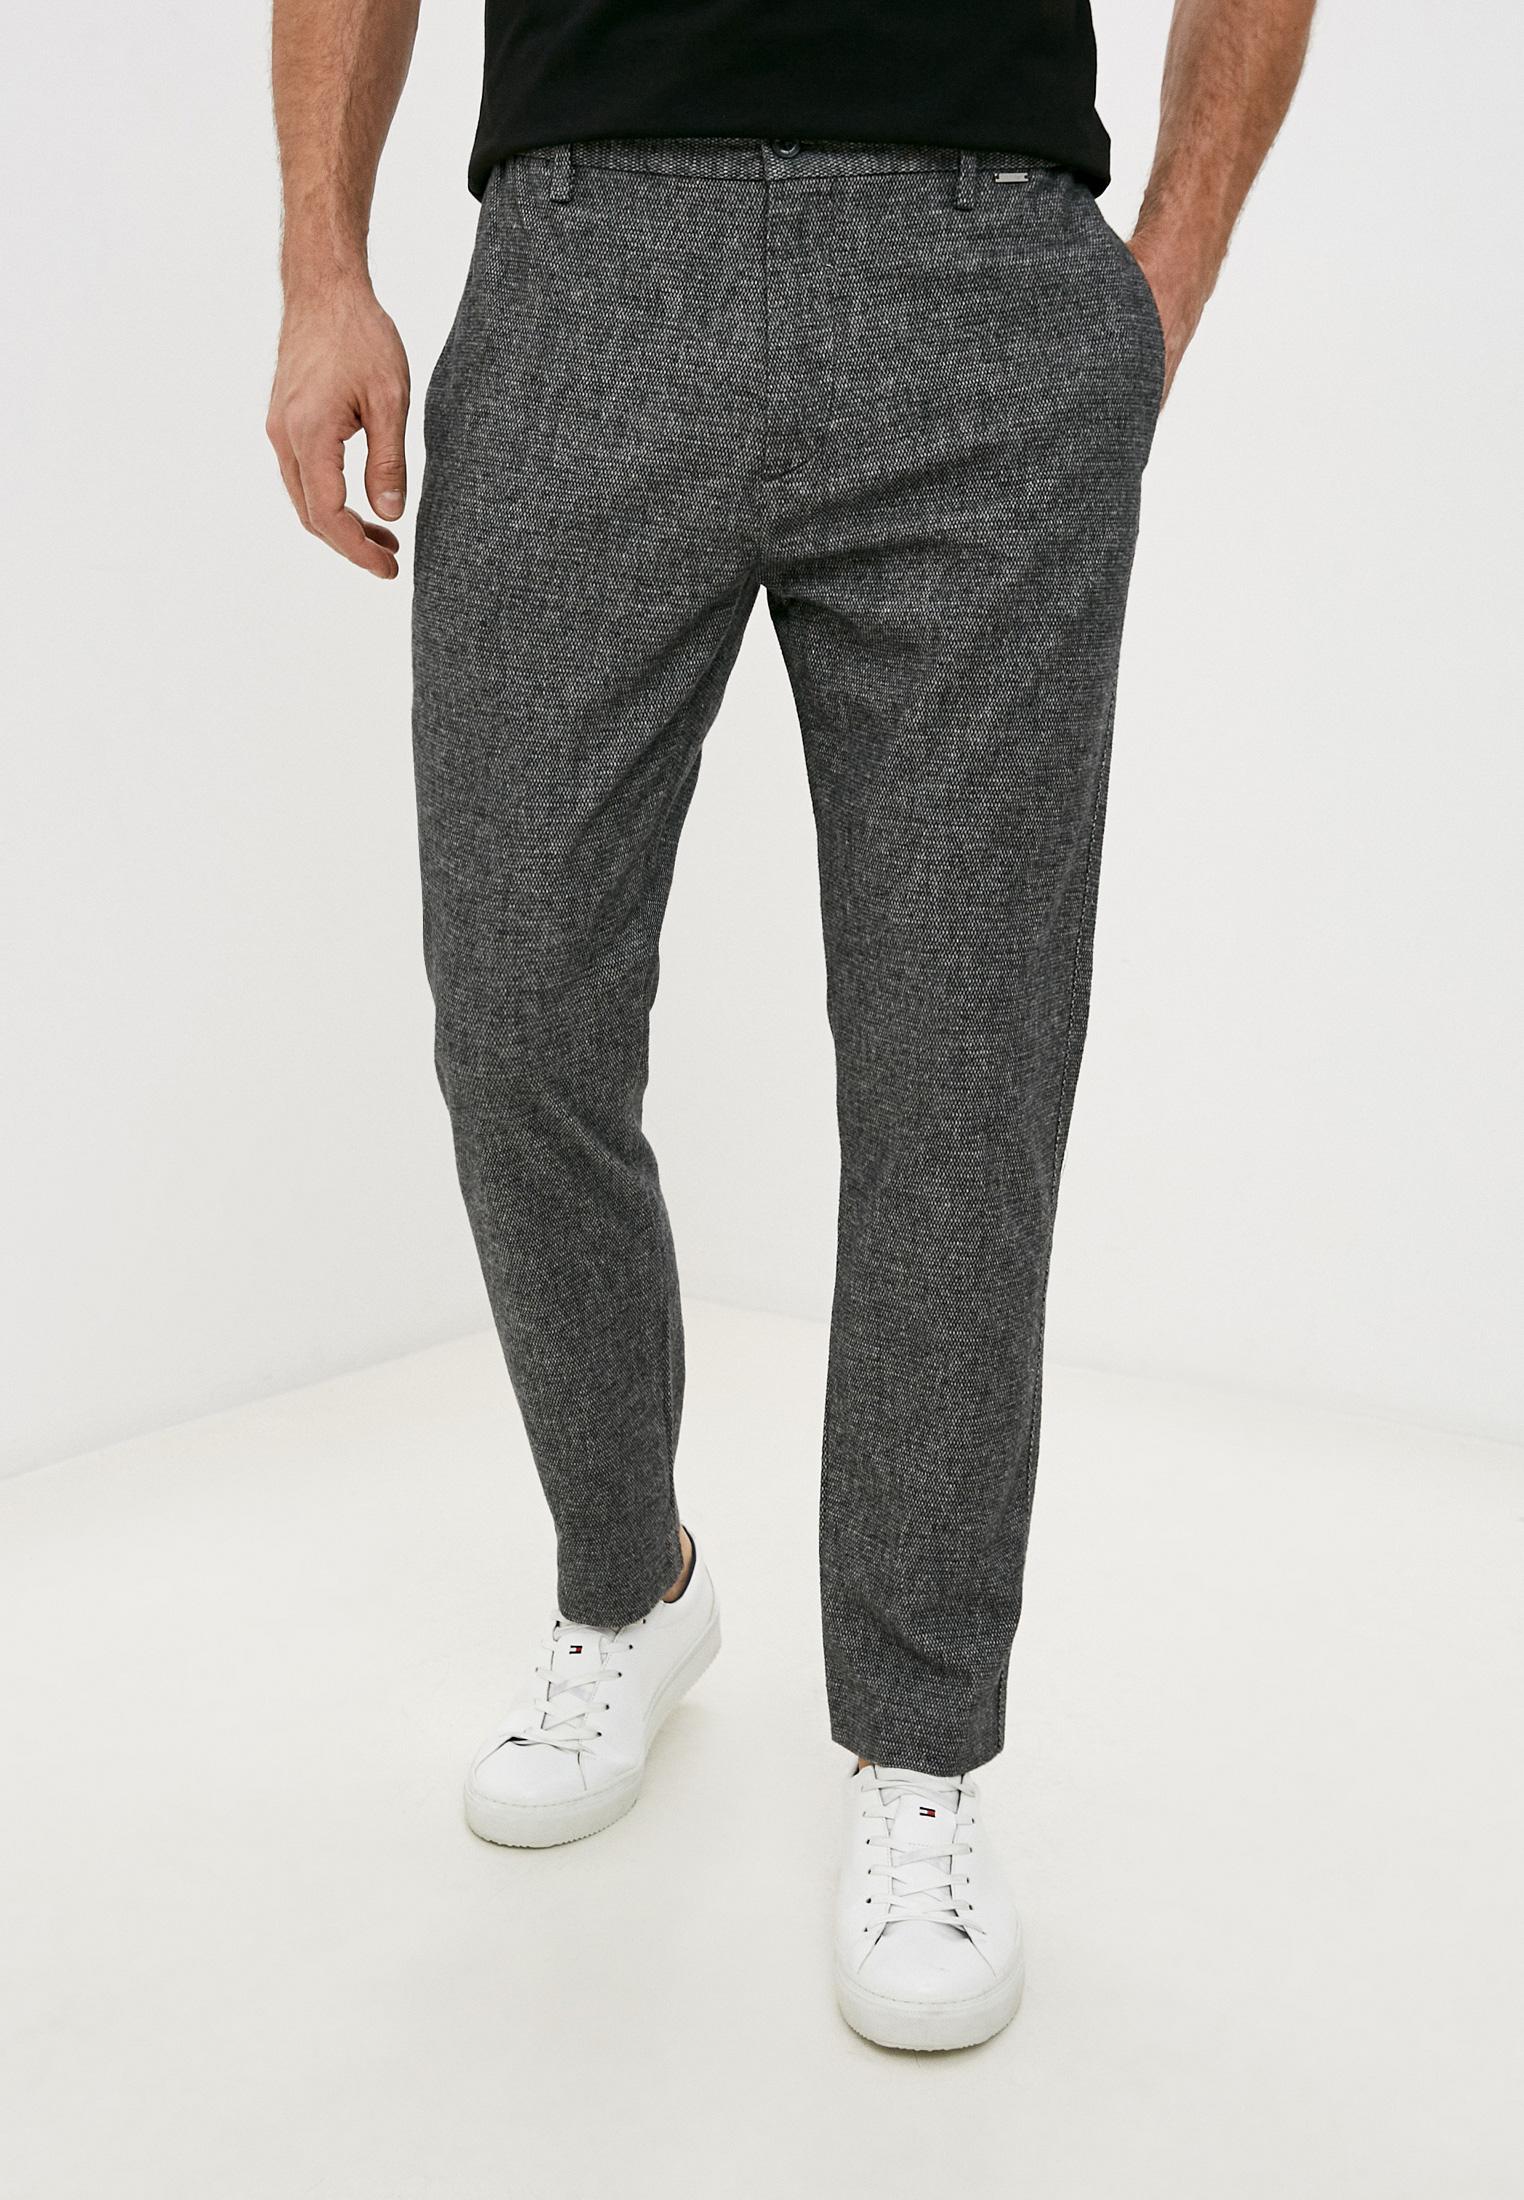 Мужские брюки Calvin Klein (Кельвин Кляйн) k10k105698